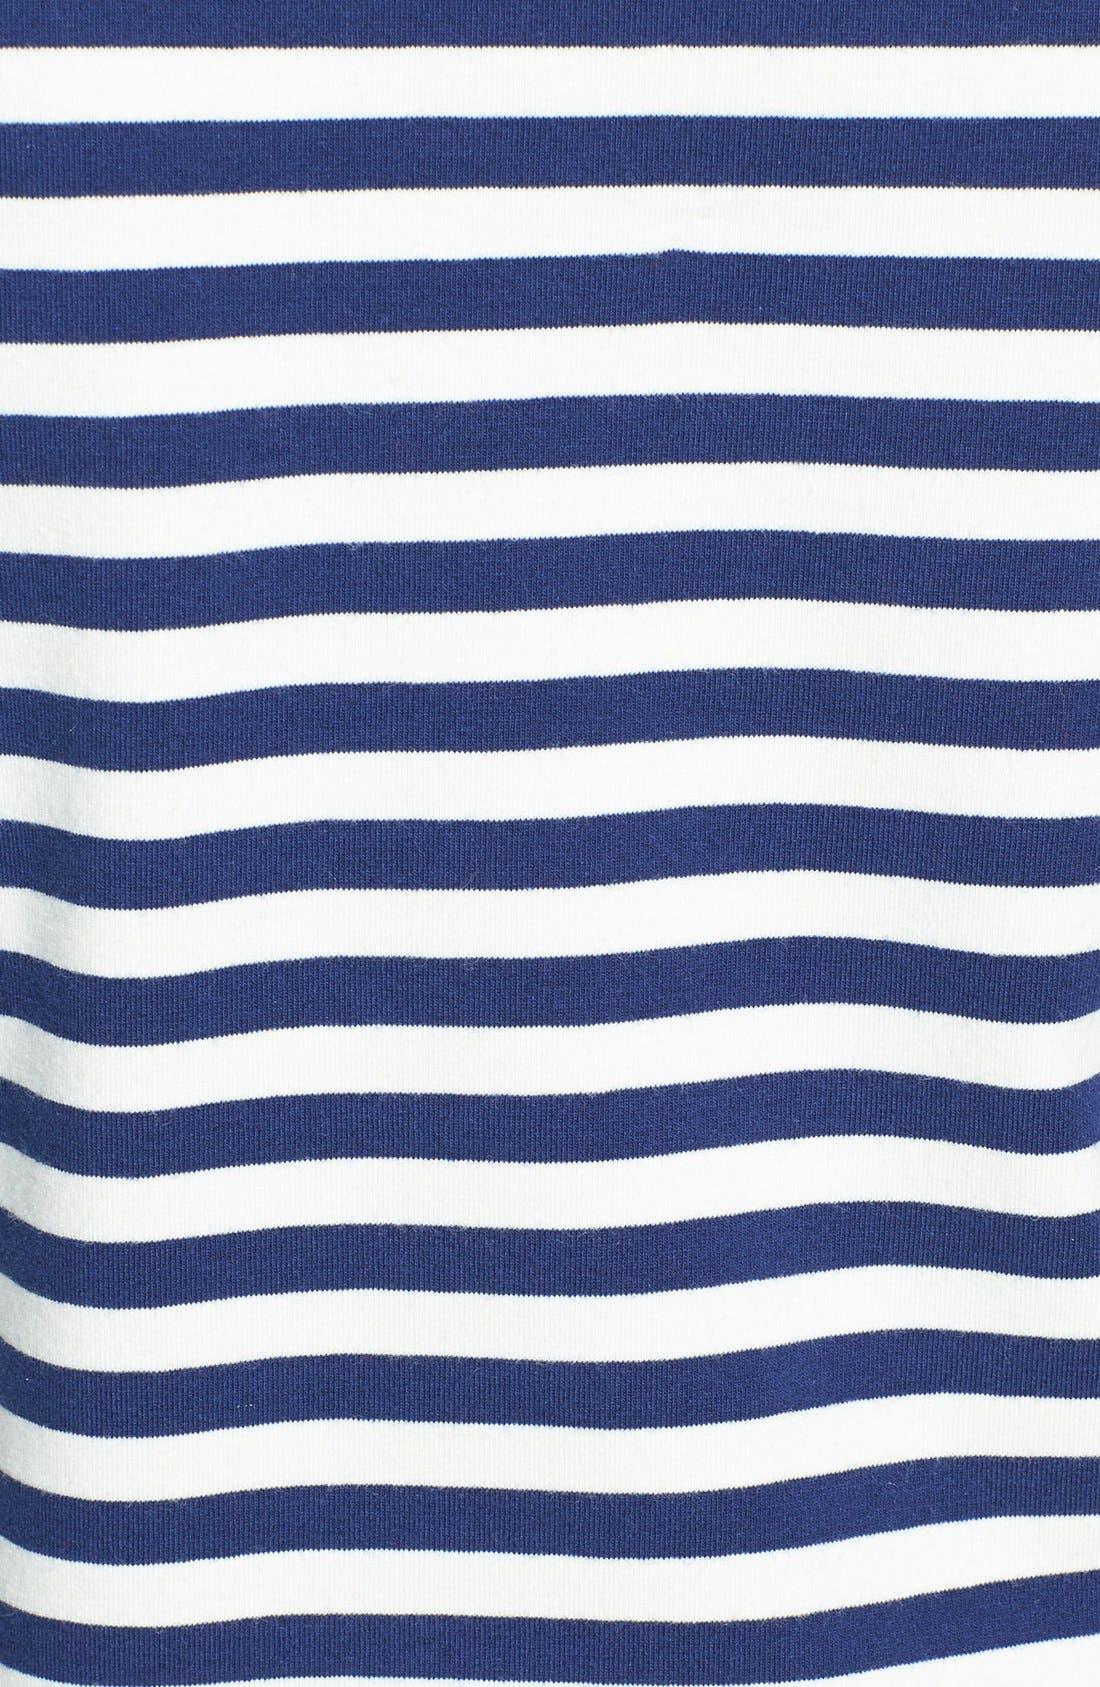 Alternate Image 3  - kate spade new york 'wheaton' stretch cotton top